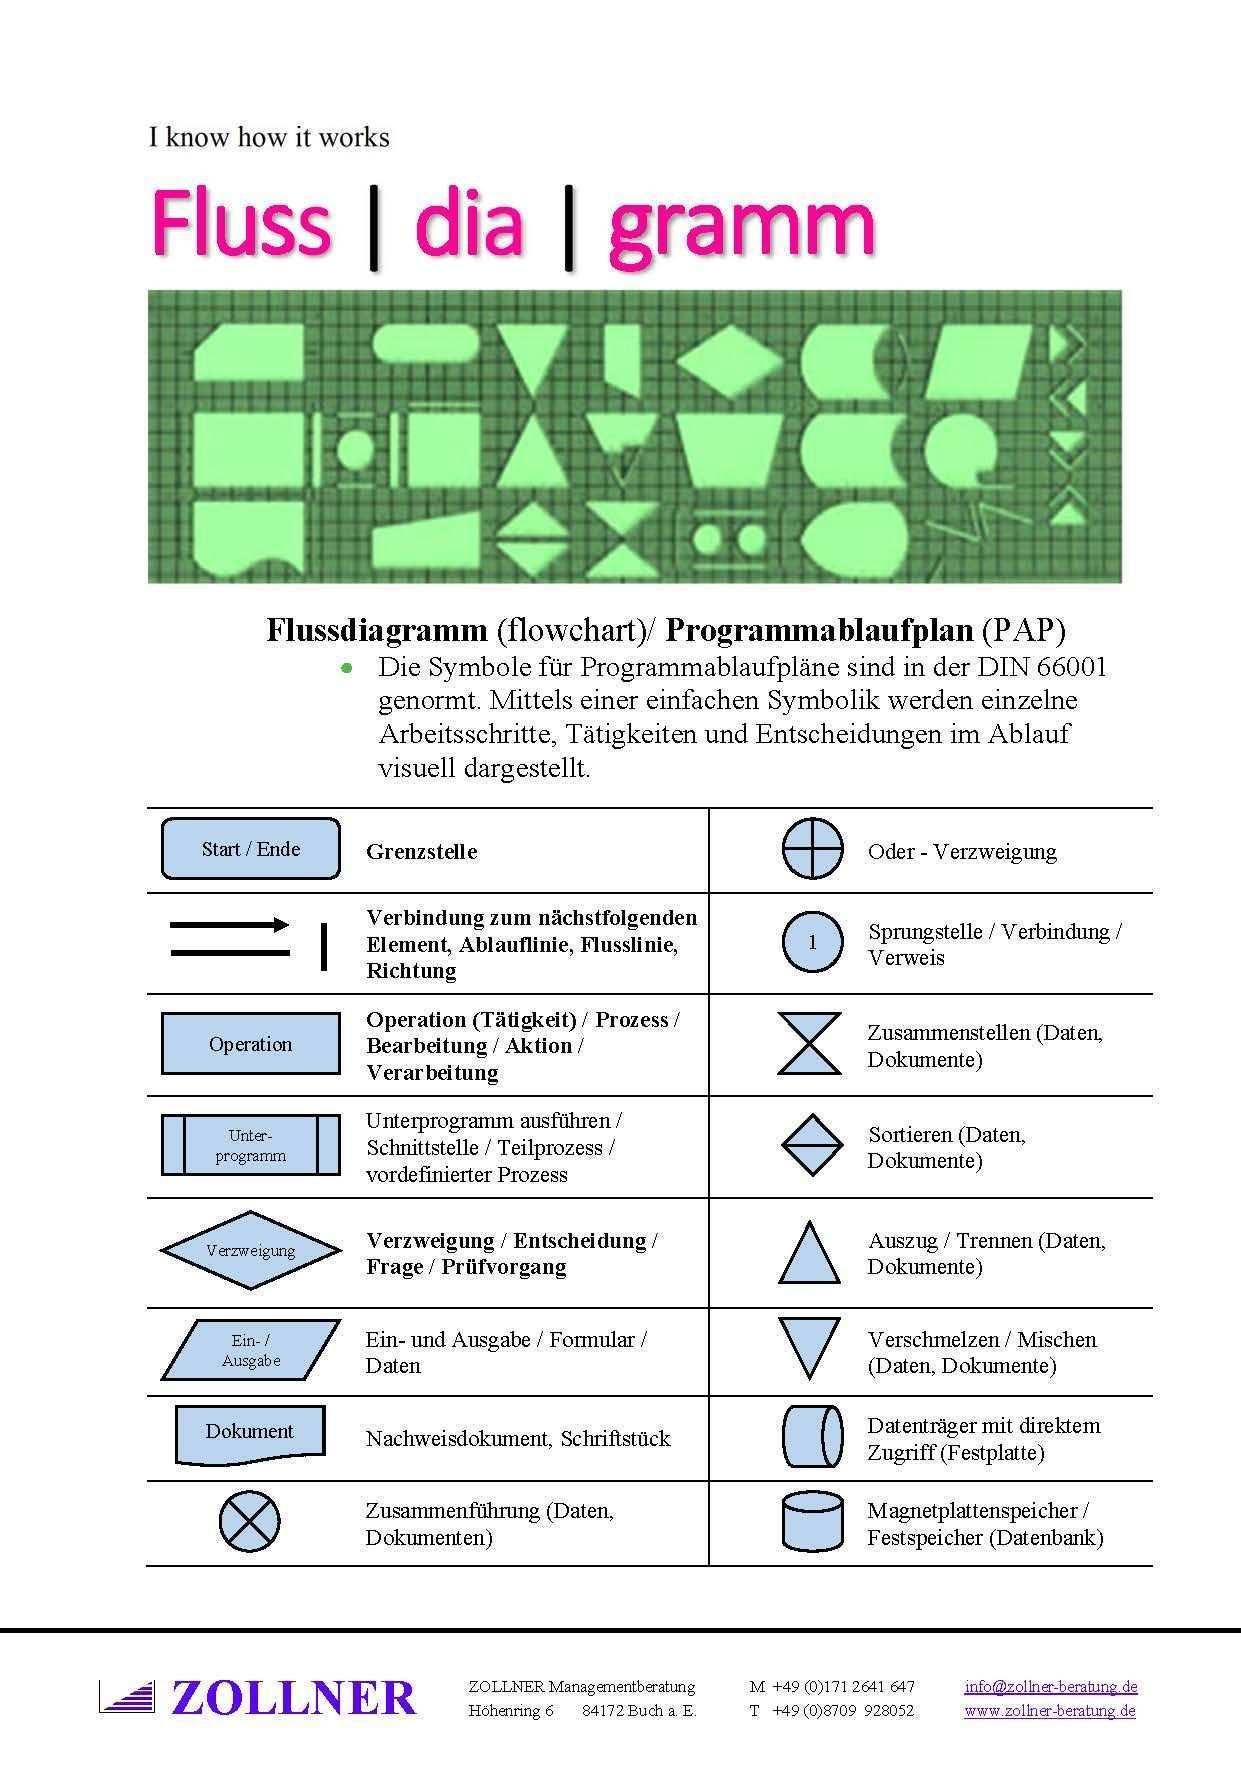 Flussdiagramm Flowchart Programmablaufplan Pap Symbole Wolfgang Zollner Flussdiagramm Programmablaufplan Studieren Tipps